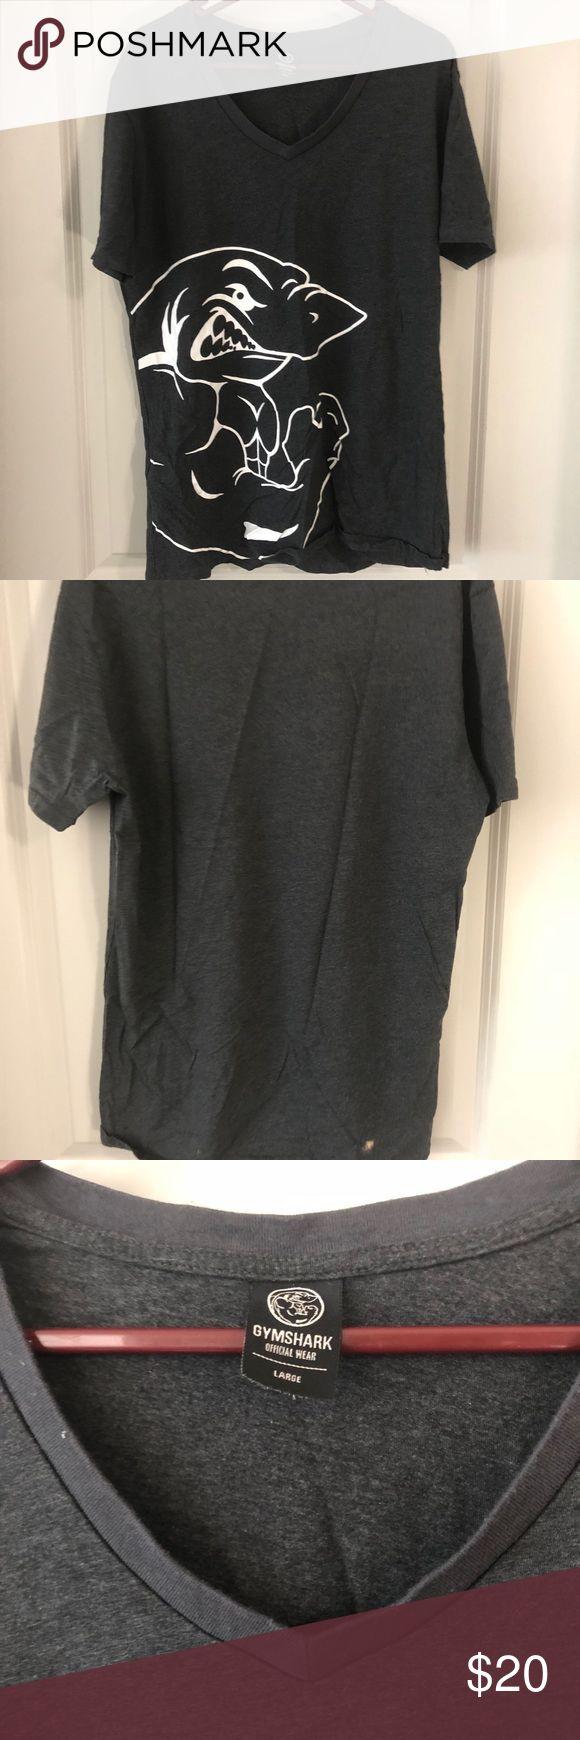 "Gymshark grey ""shark"" t-shirt Size L Gymshark grey ""shark"" t-shirt Size L Gymshark Shirts Tees - Short Sleeve"